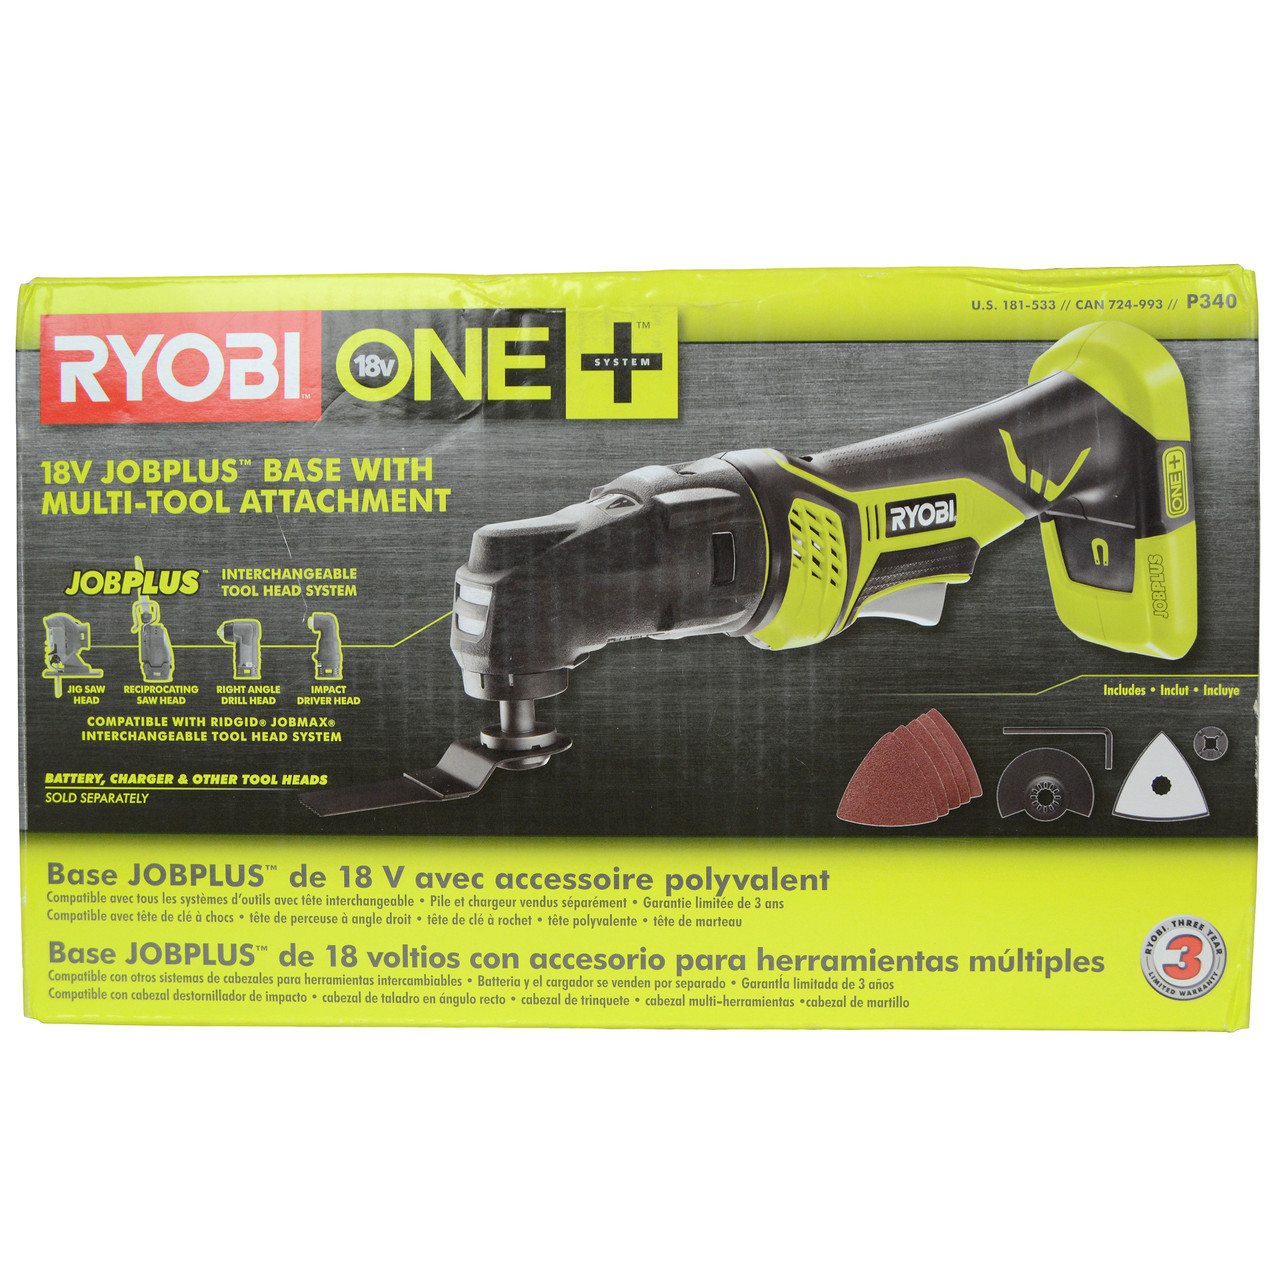 Ryobi P340 ONE+ 18V Lithium-Ion Job Plus Multi Tool, Tool Only